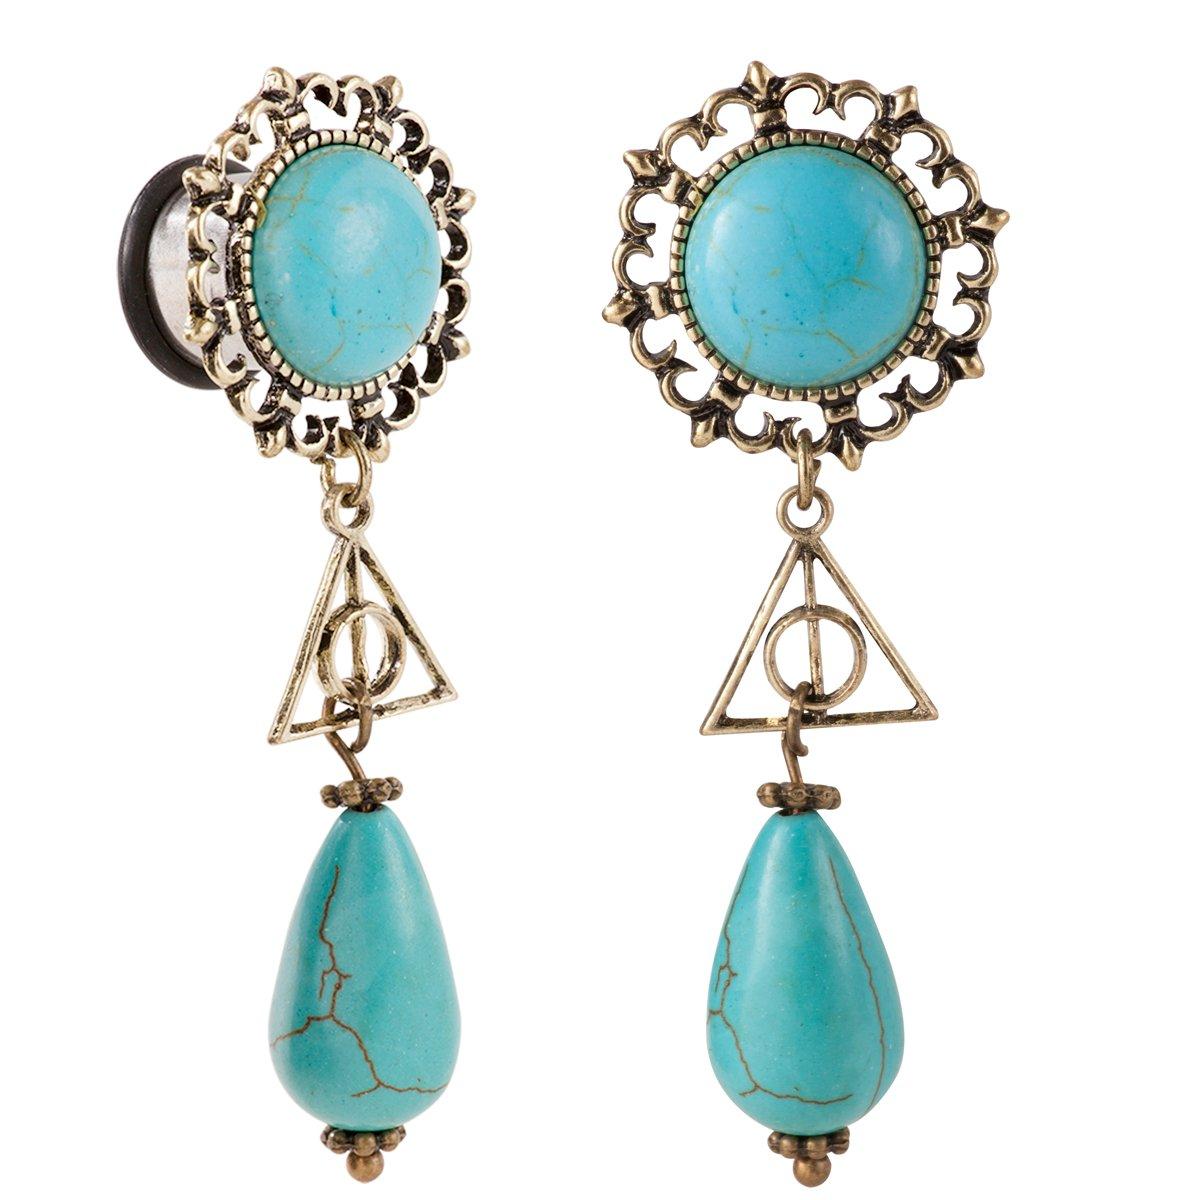 Bigbabybig Turquoise Ear Gauges 9/16 Dangle Earrings Plugs Tunnels Body Piercing Jewelry for Women